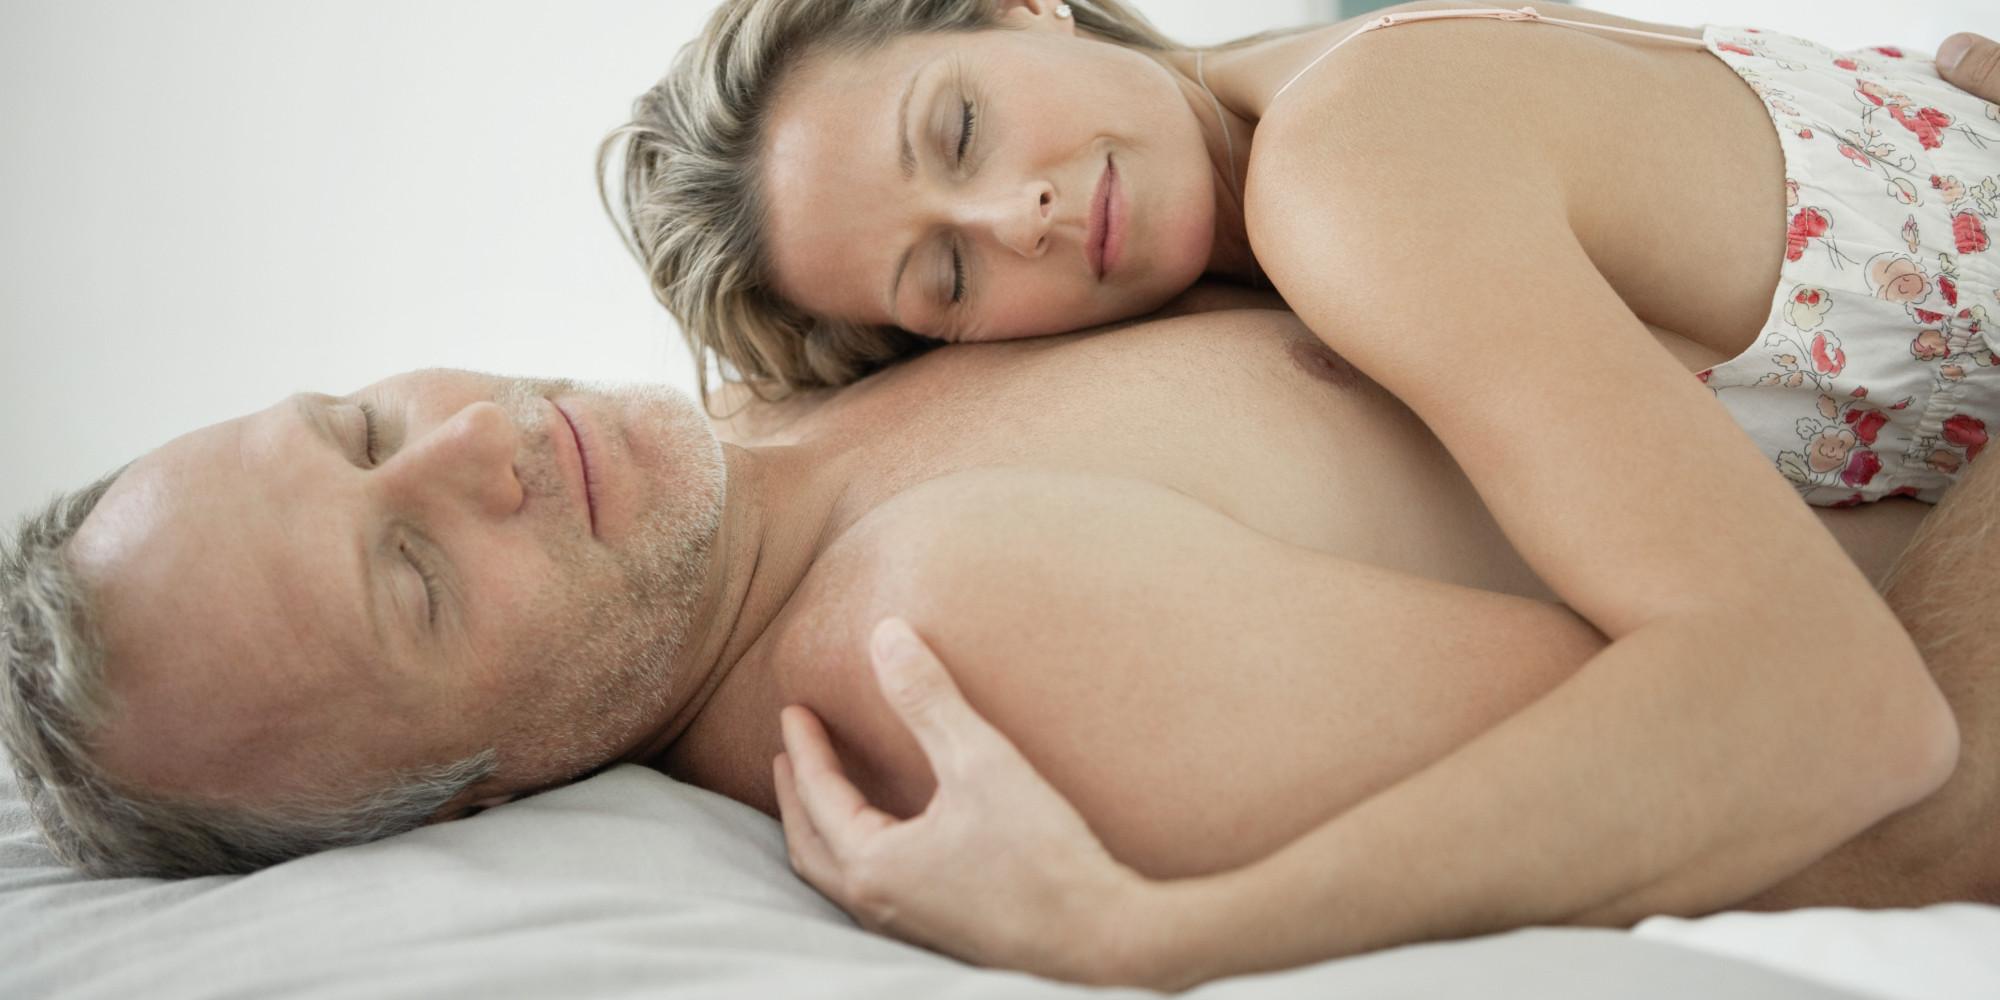 women and making love Mature men